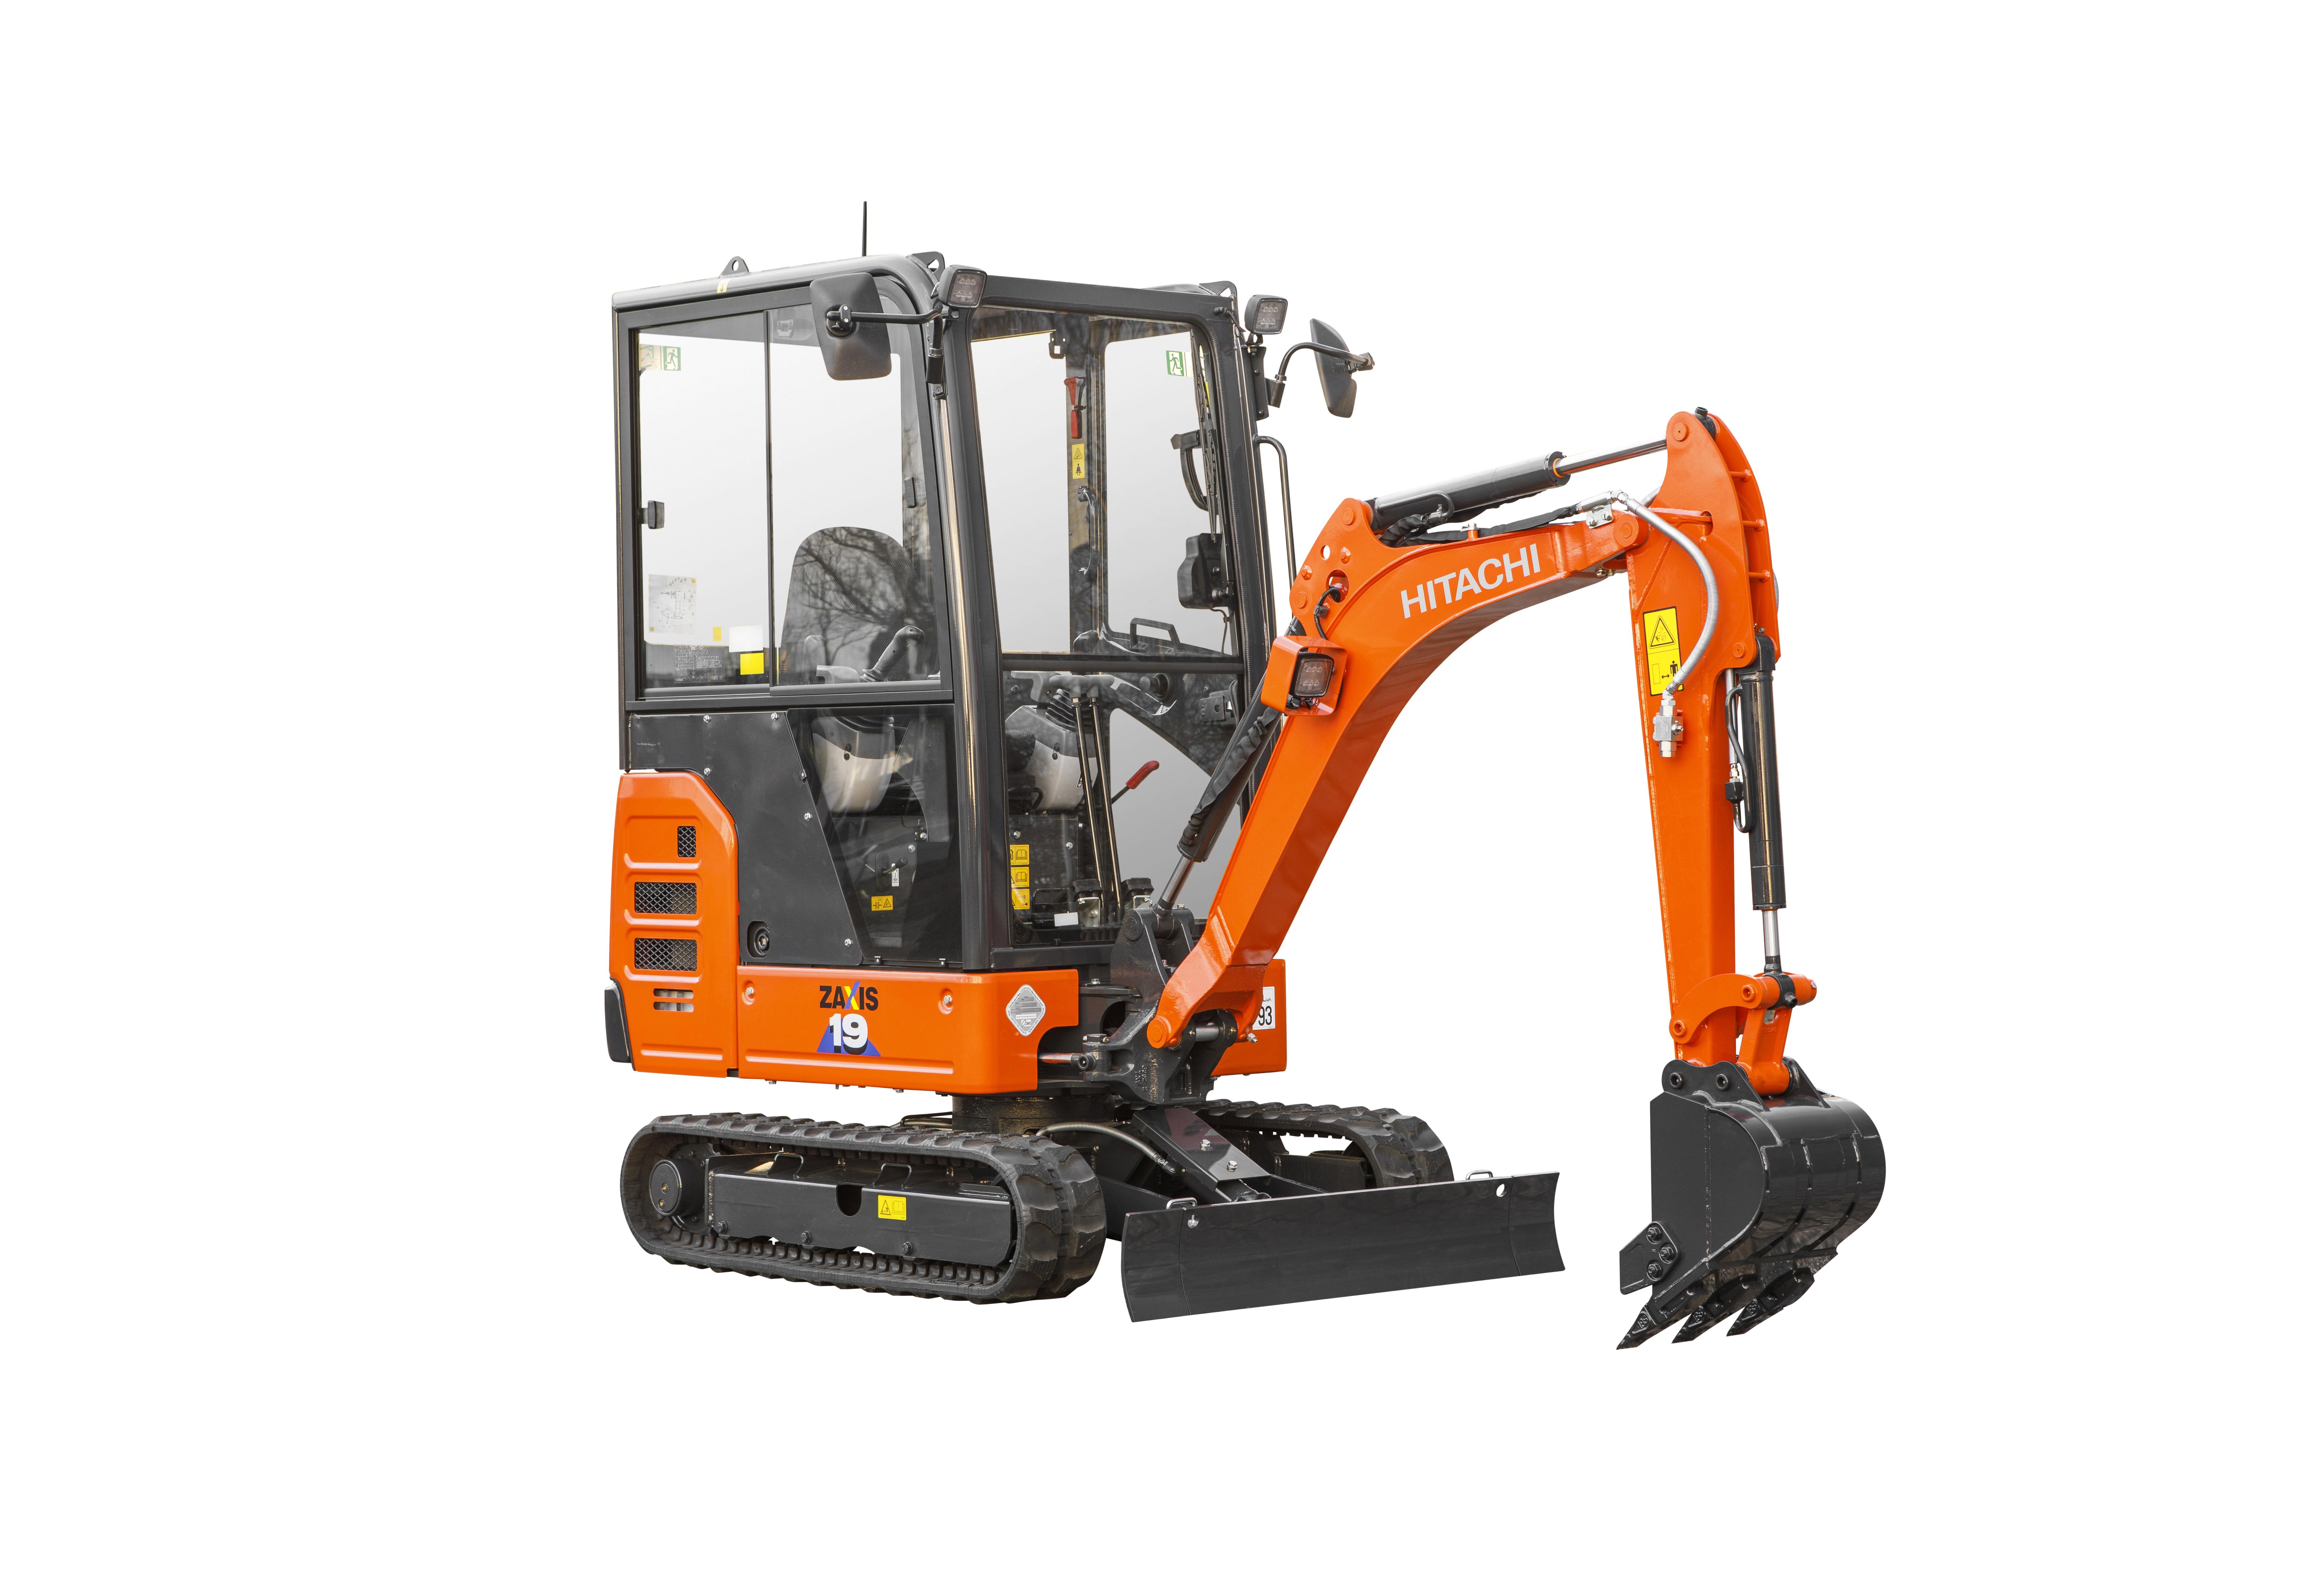 Zx hitachi construction machinery. Backhoe clipart excavator arm